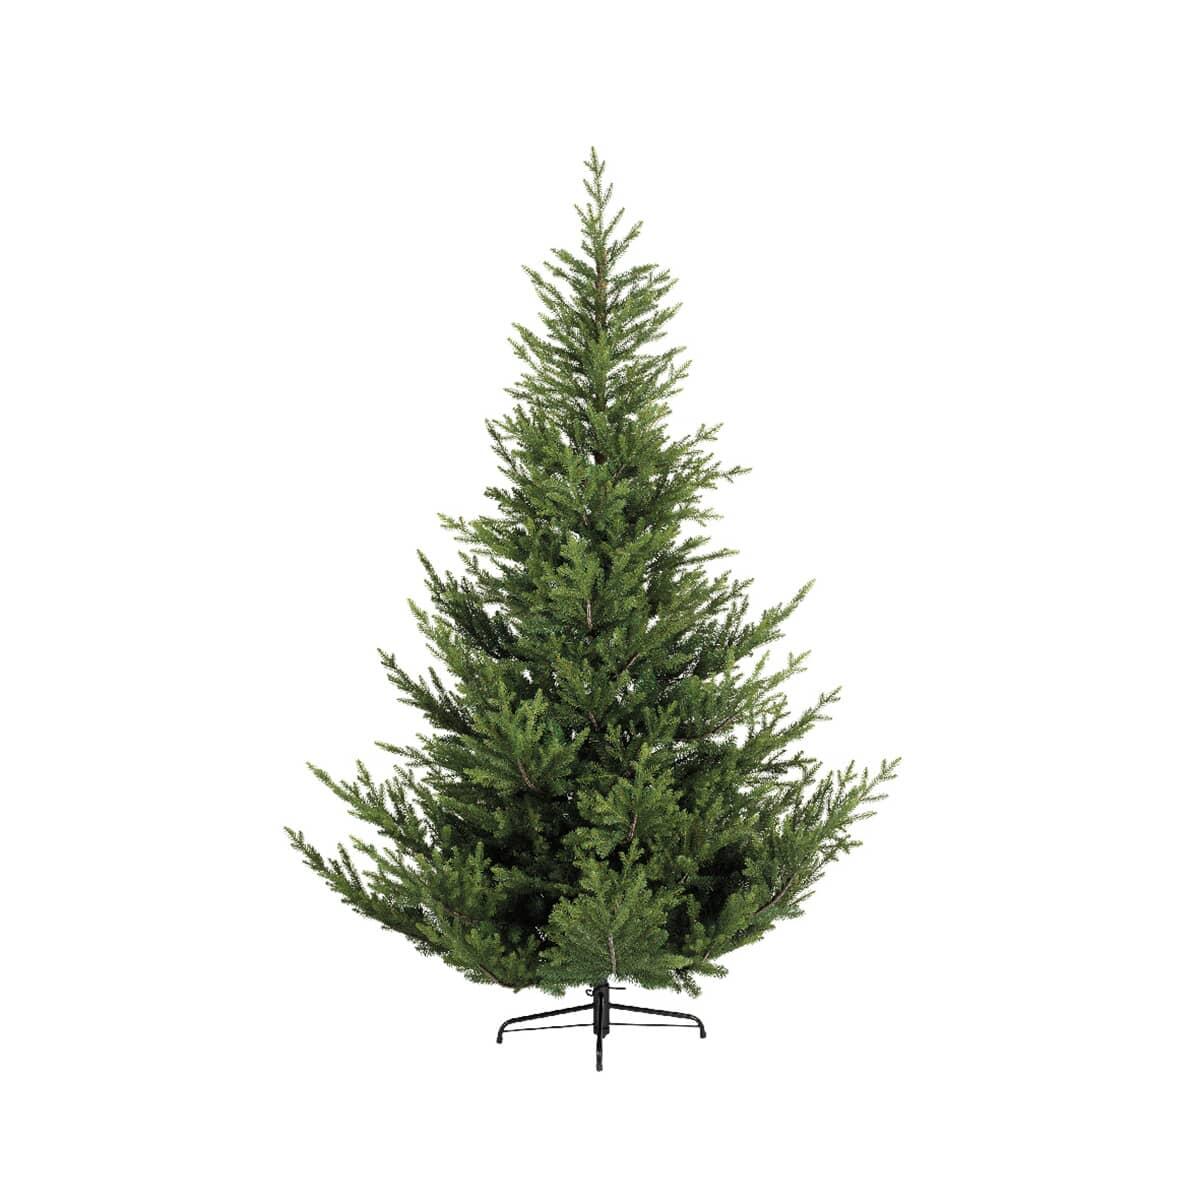 Kaemingk Liberty spruce 240cm